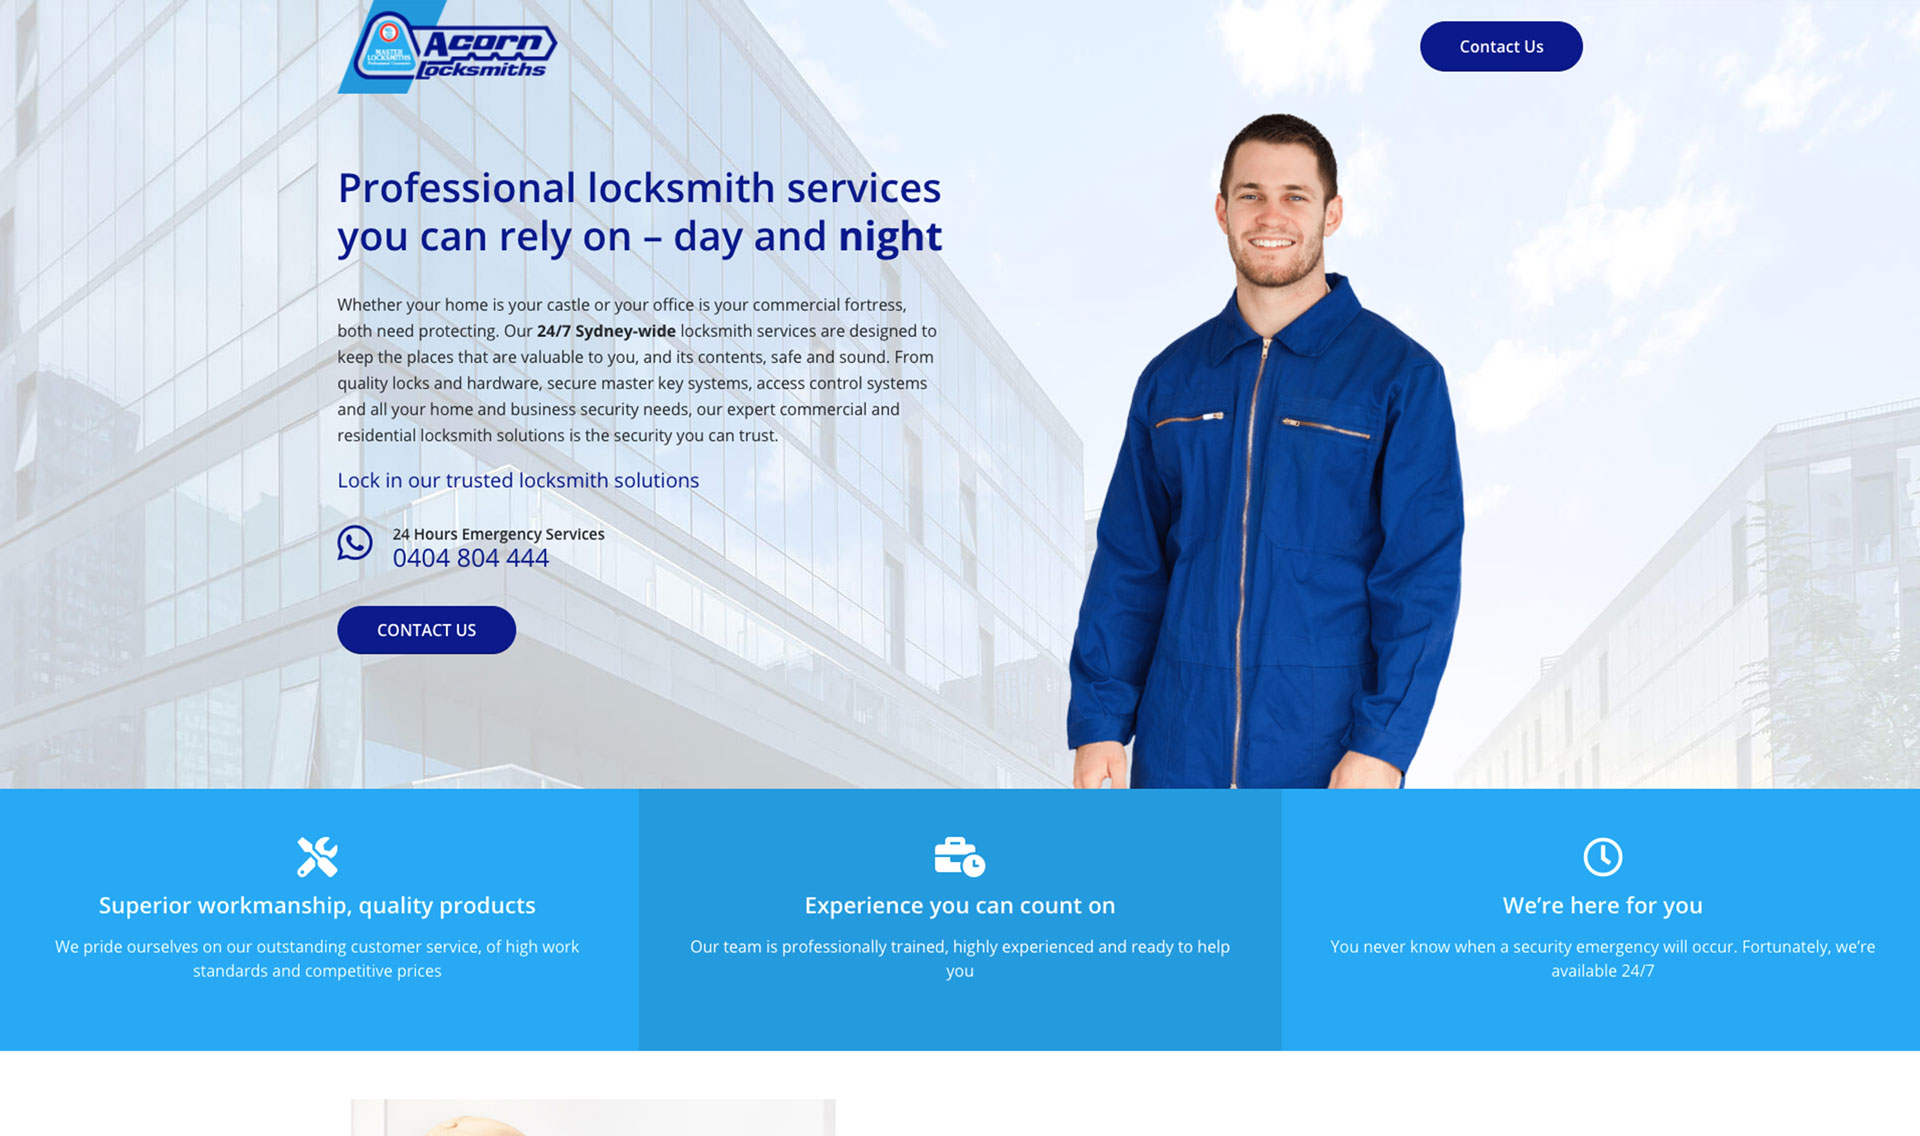 Website design for locksmith solutions